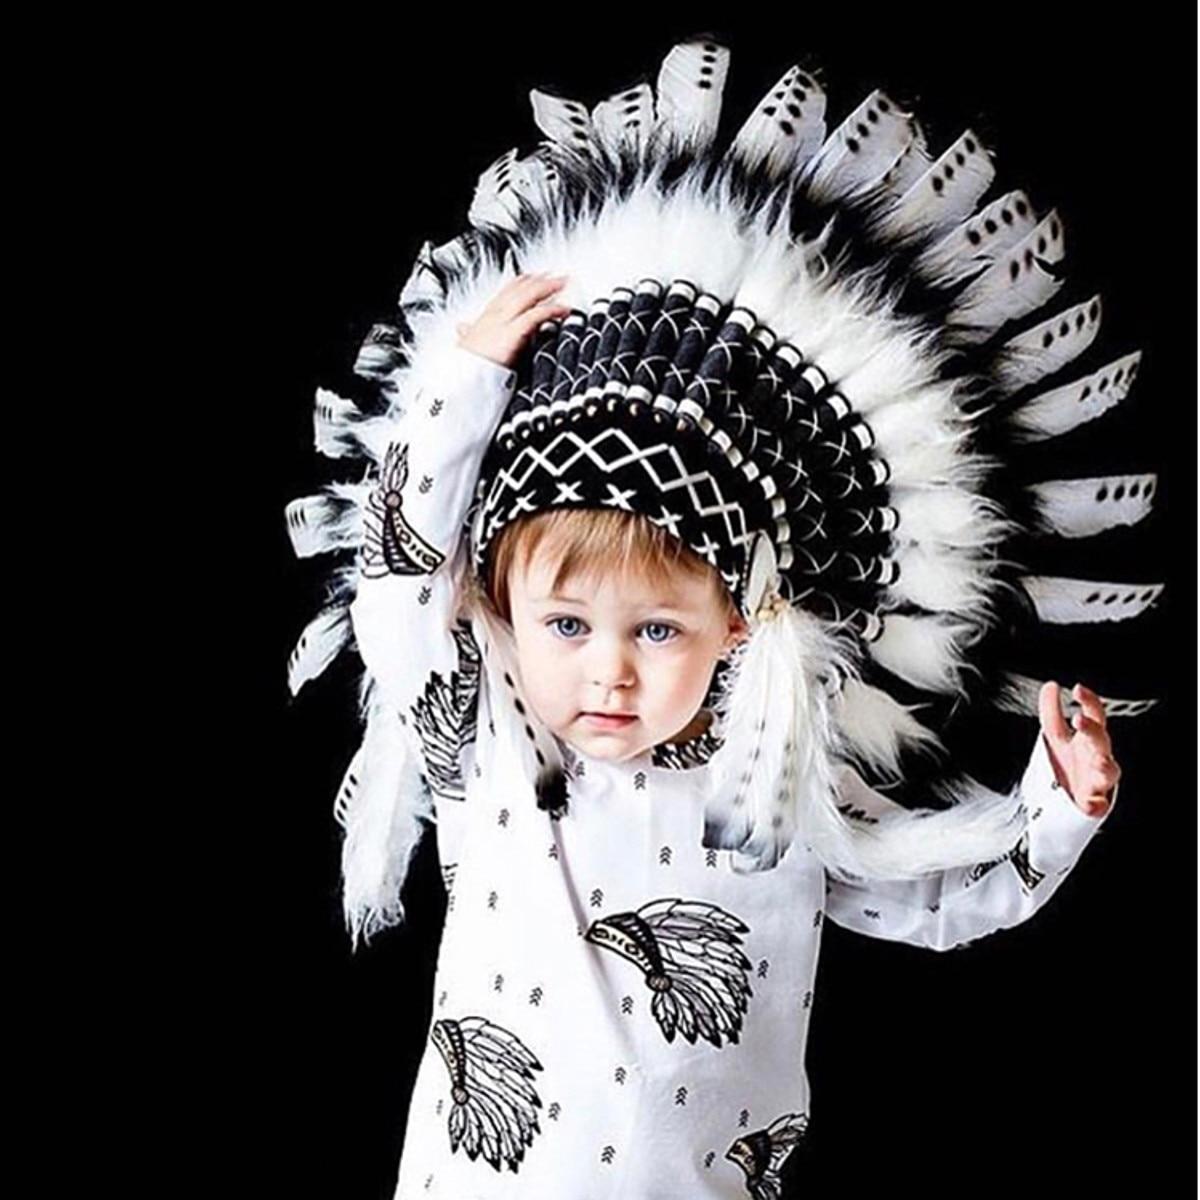 Feather Headband Headpiece Indian Feather Headdress Headwear Hat Party Decoration Photo Props